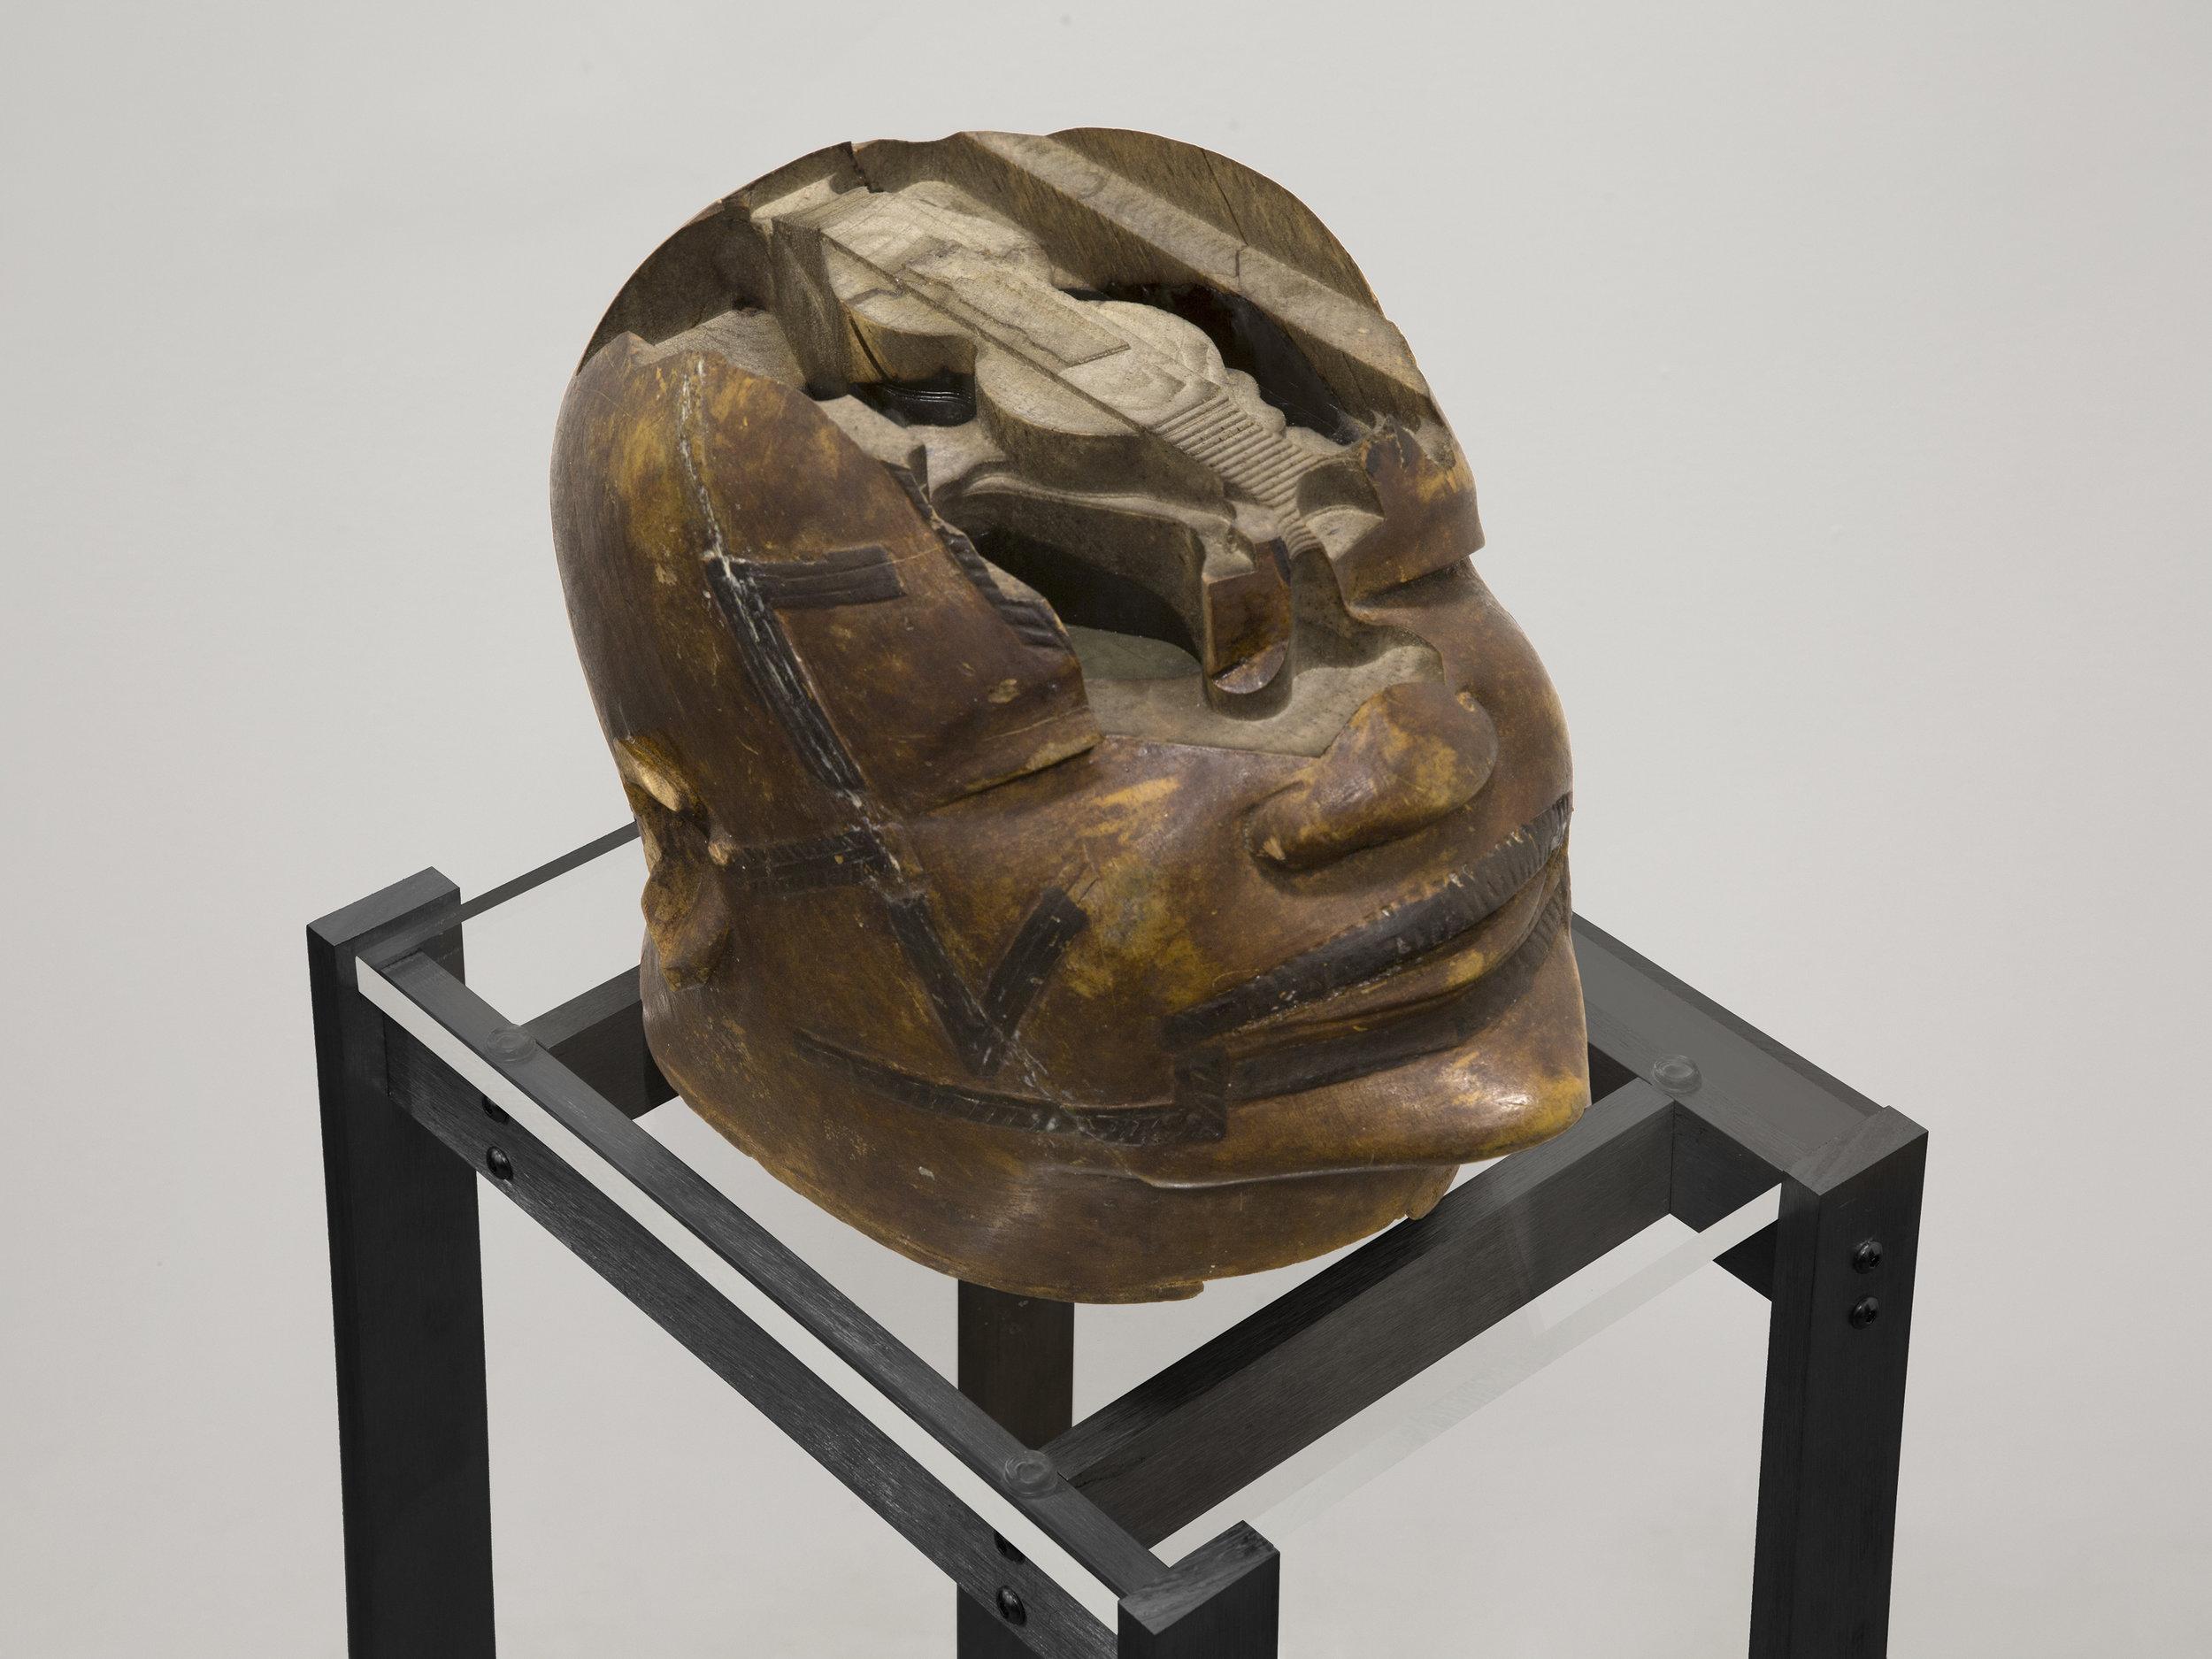 Matthew Angelo Harrison,  Synthetic Lipiko - Caliper Study , 2018, Wooden sculpture, anodized aluminum, acrylic. 56 x 21 1/2 x 22 3/4 inches